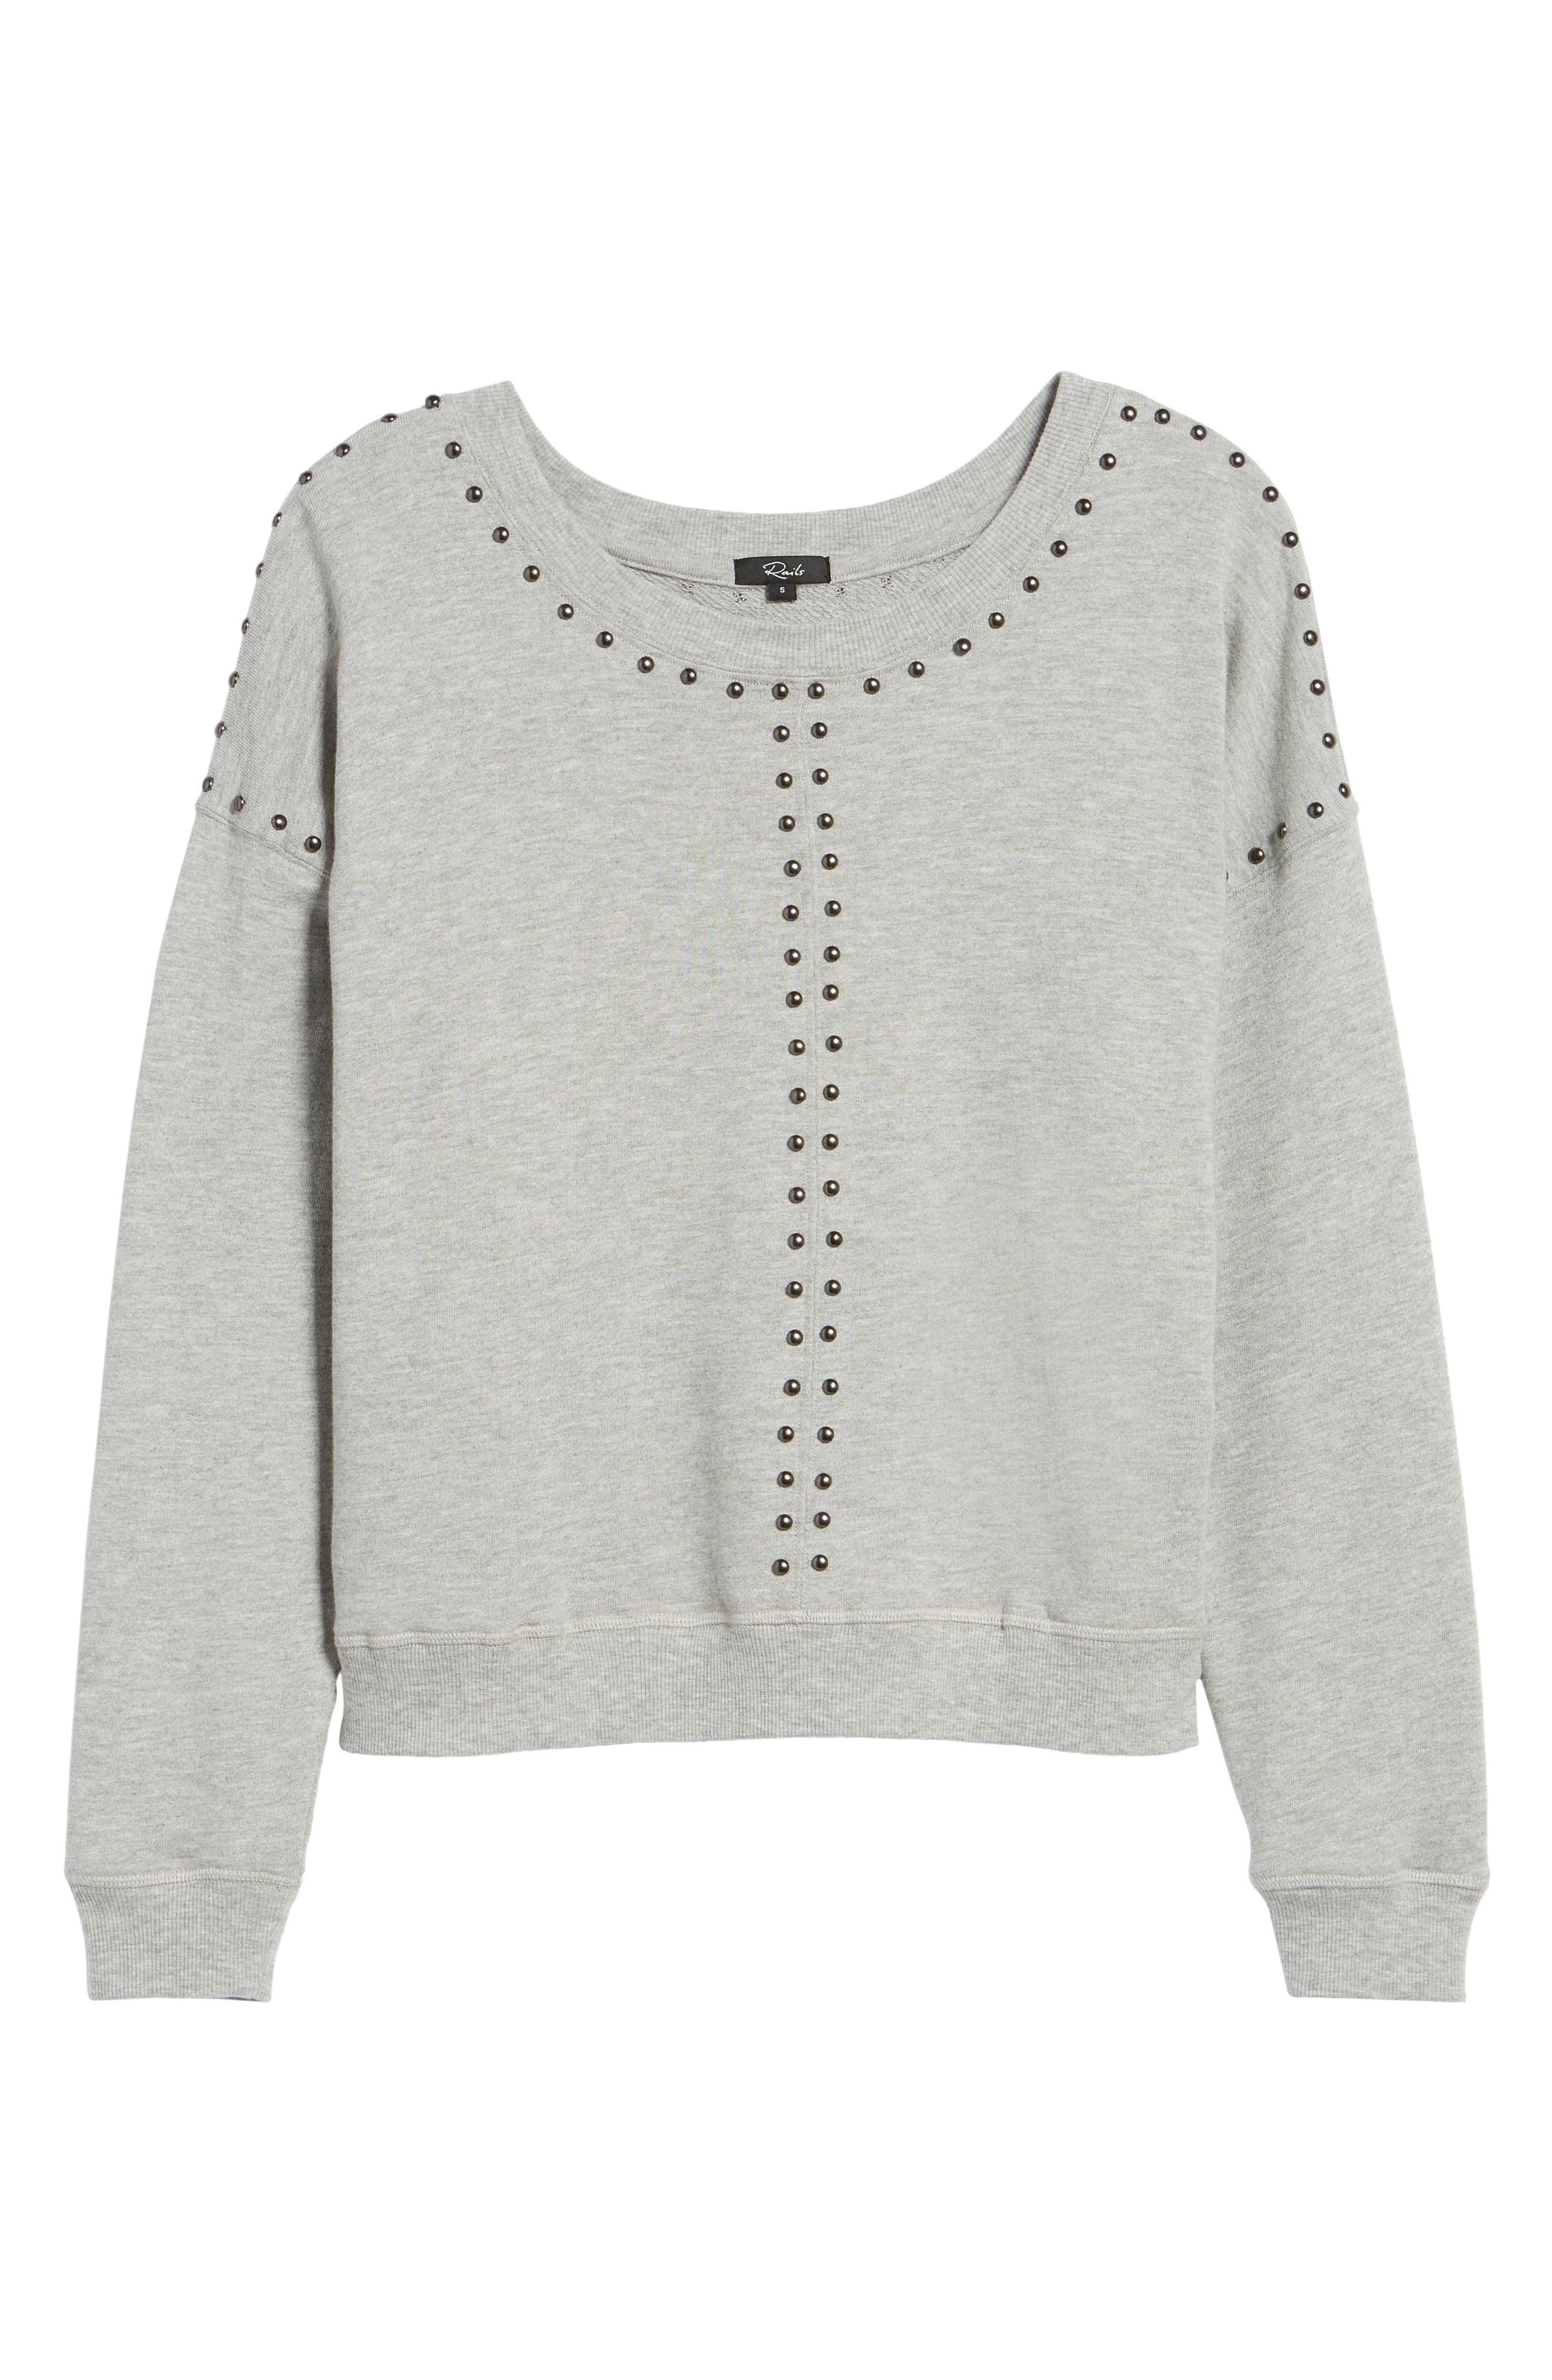 Wilson Studded Sweatshirt,                             Alternate thumbnail 6, color,                             052